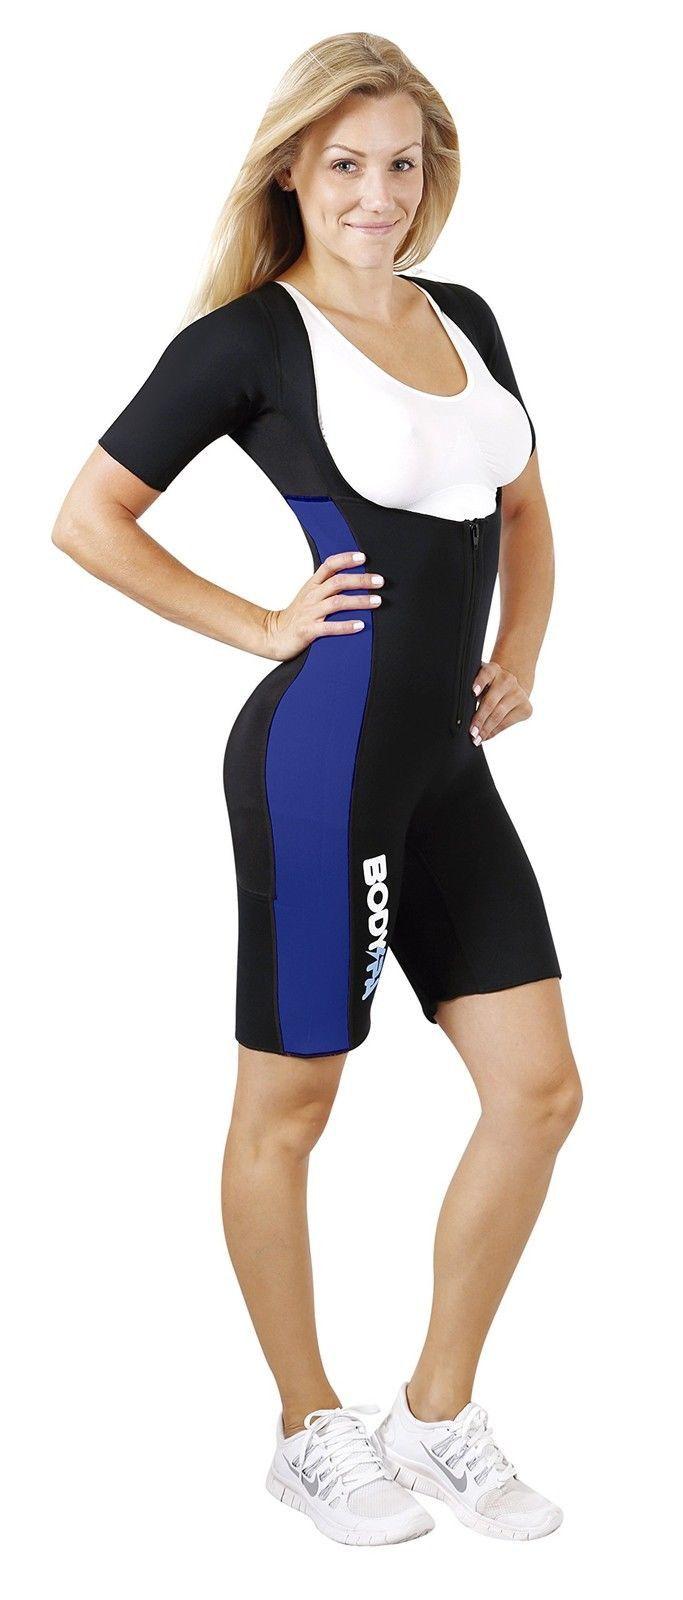 Body SPA Light Body Sauna Suit Neoprene Full Body Shaper GYM Sport Aerobic (B...